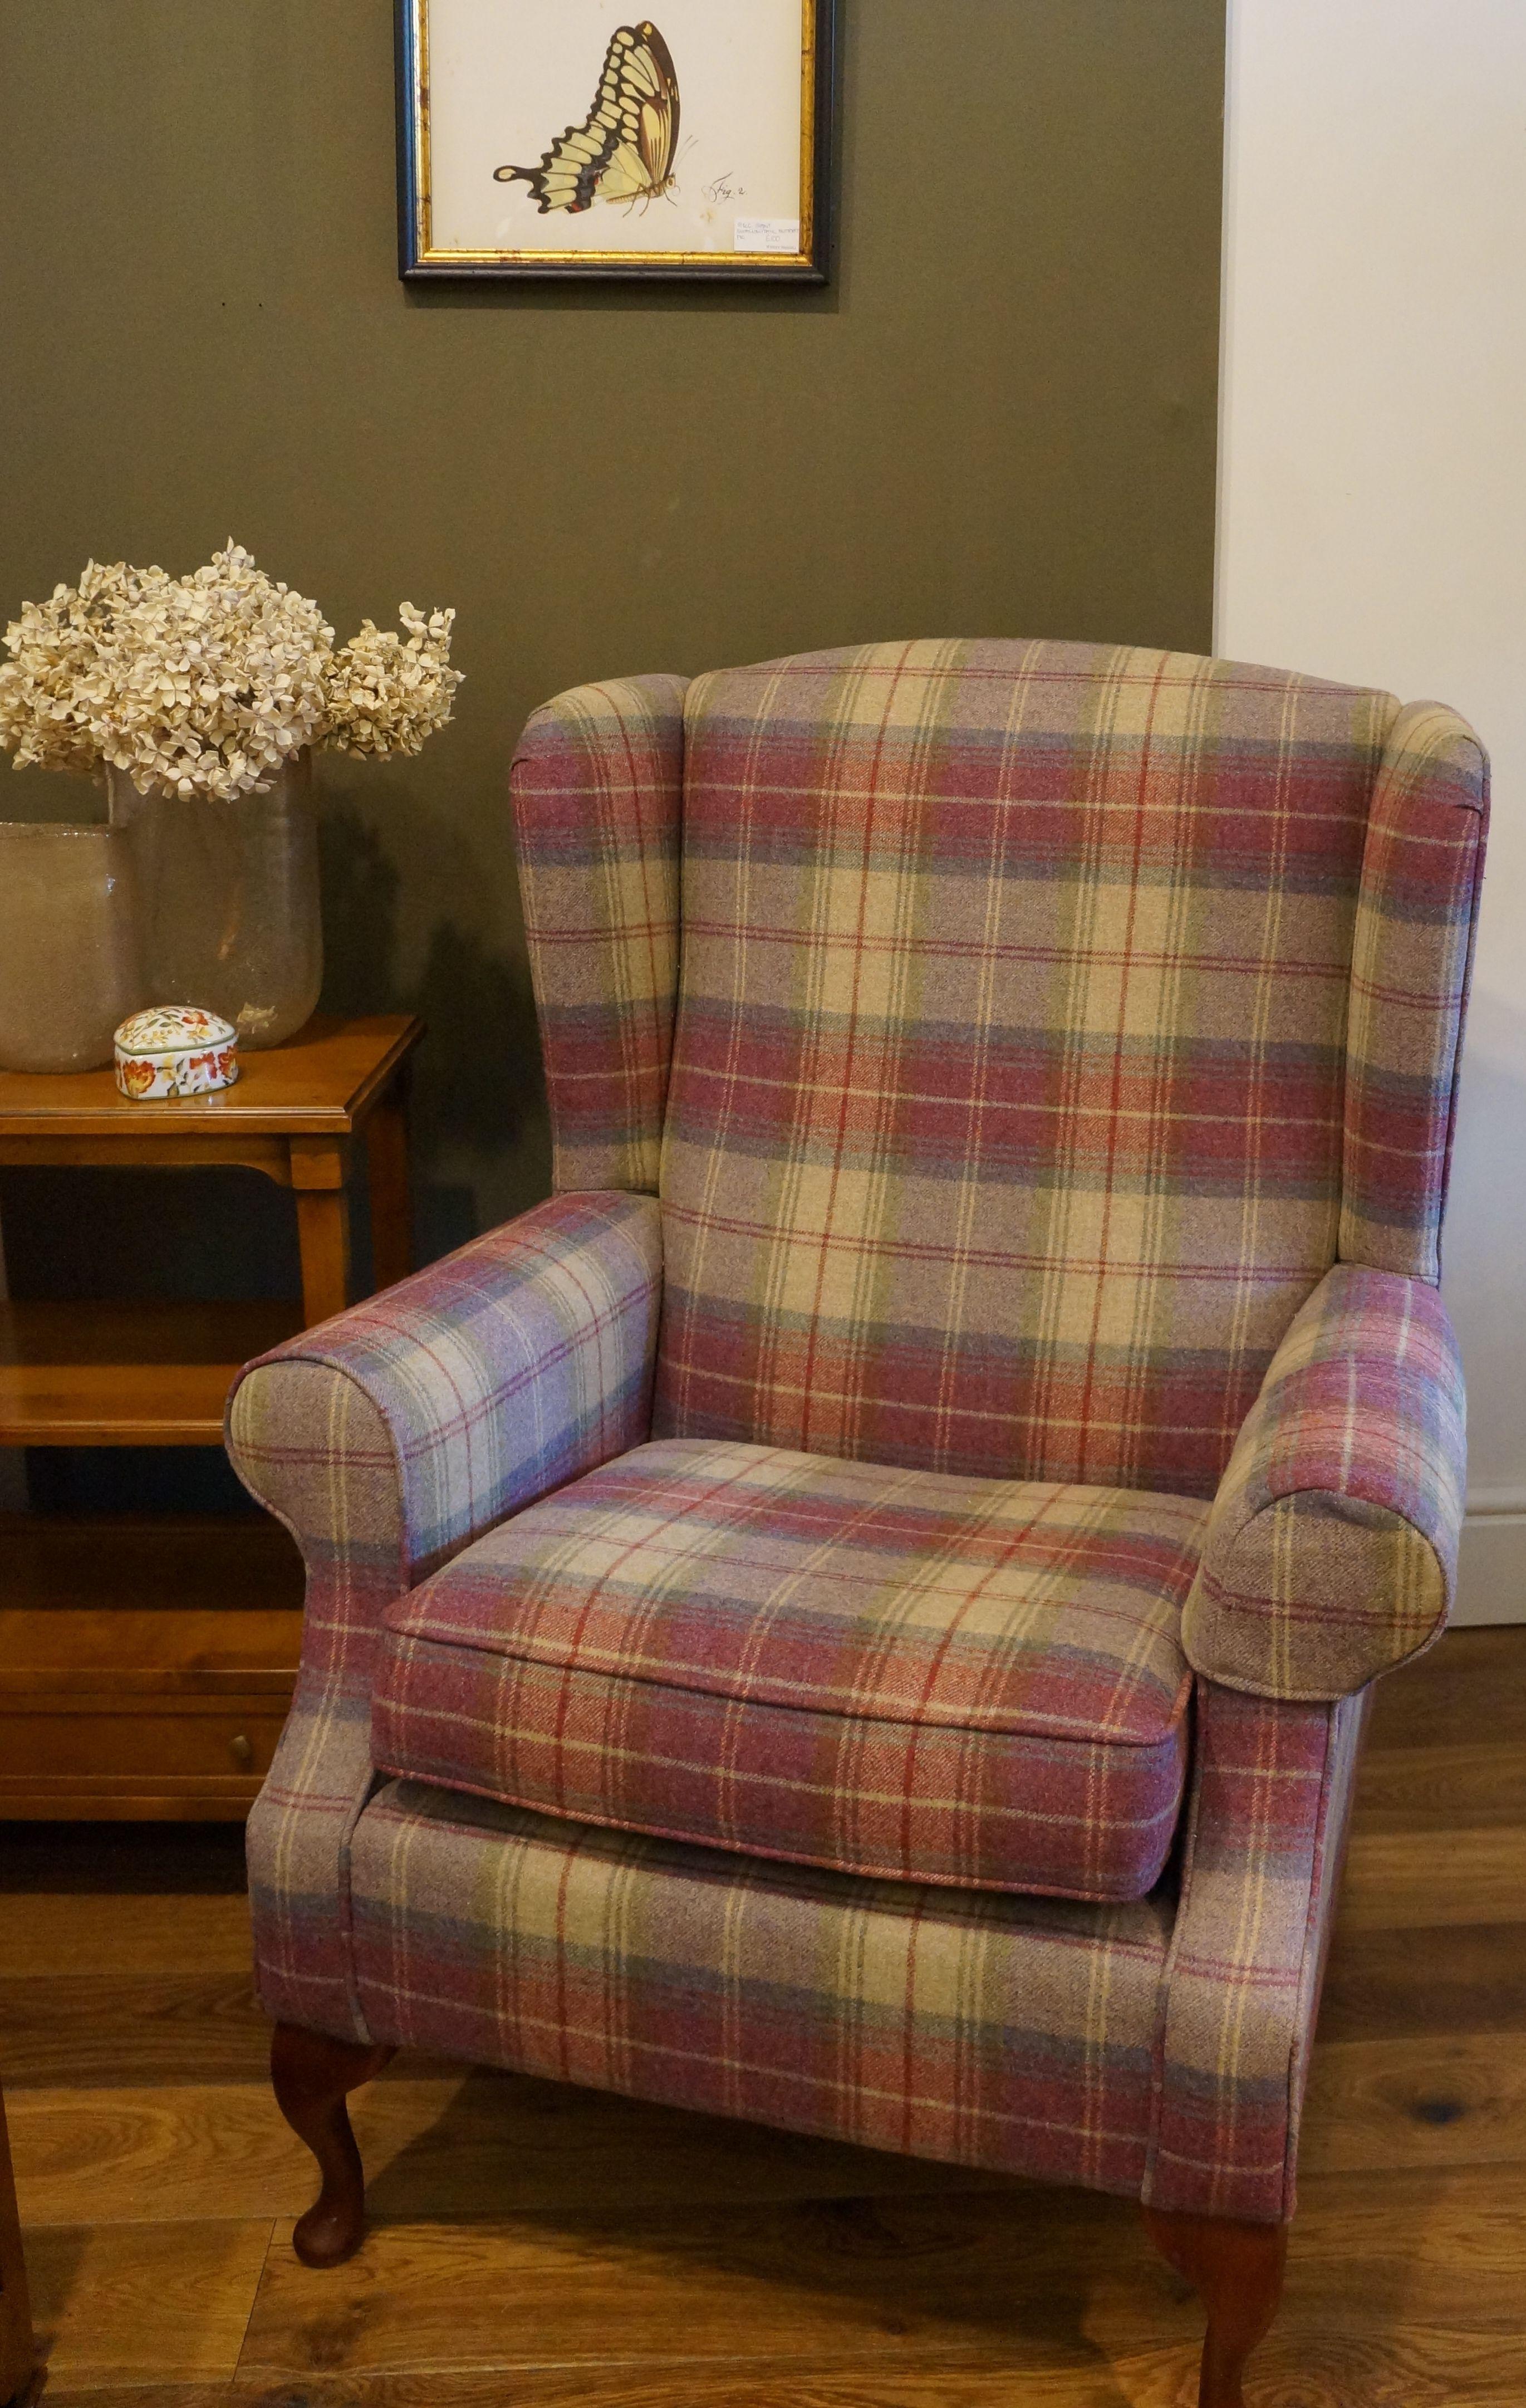 wingback chair covers ireland big joe chairs at walmart blenheim wing back in sanderson highlands plaid